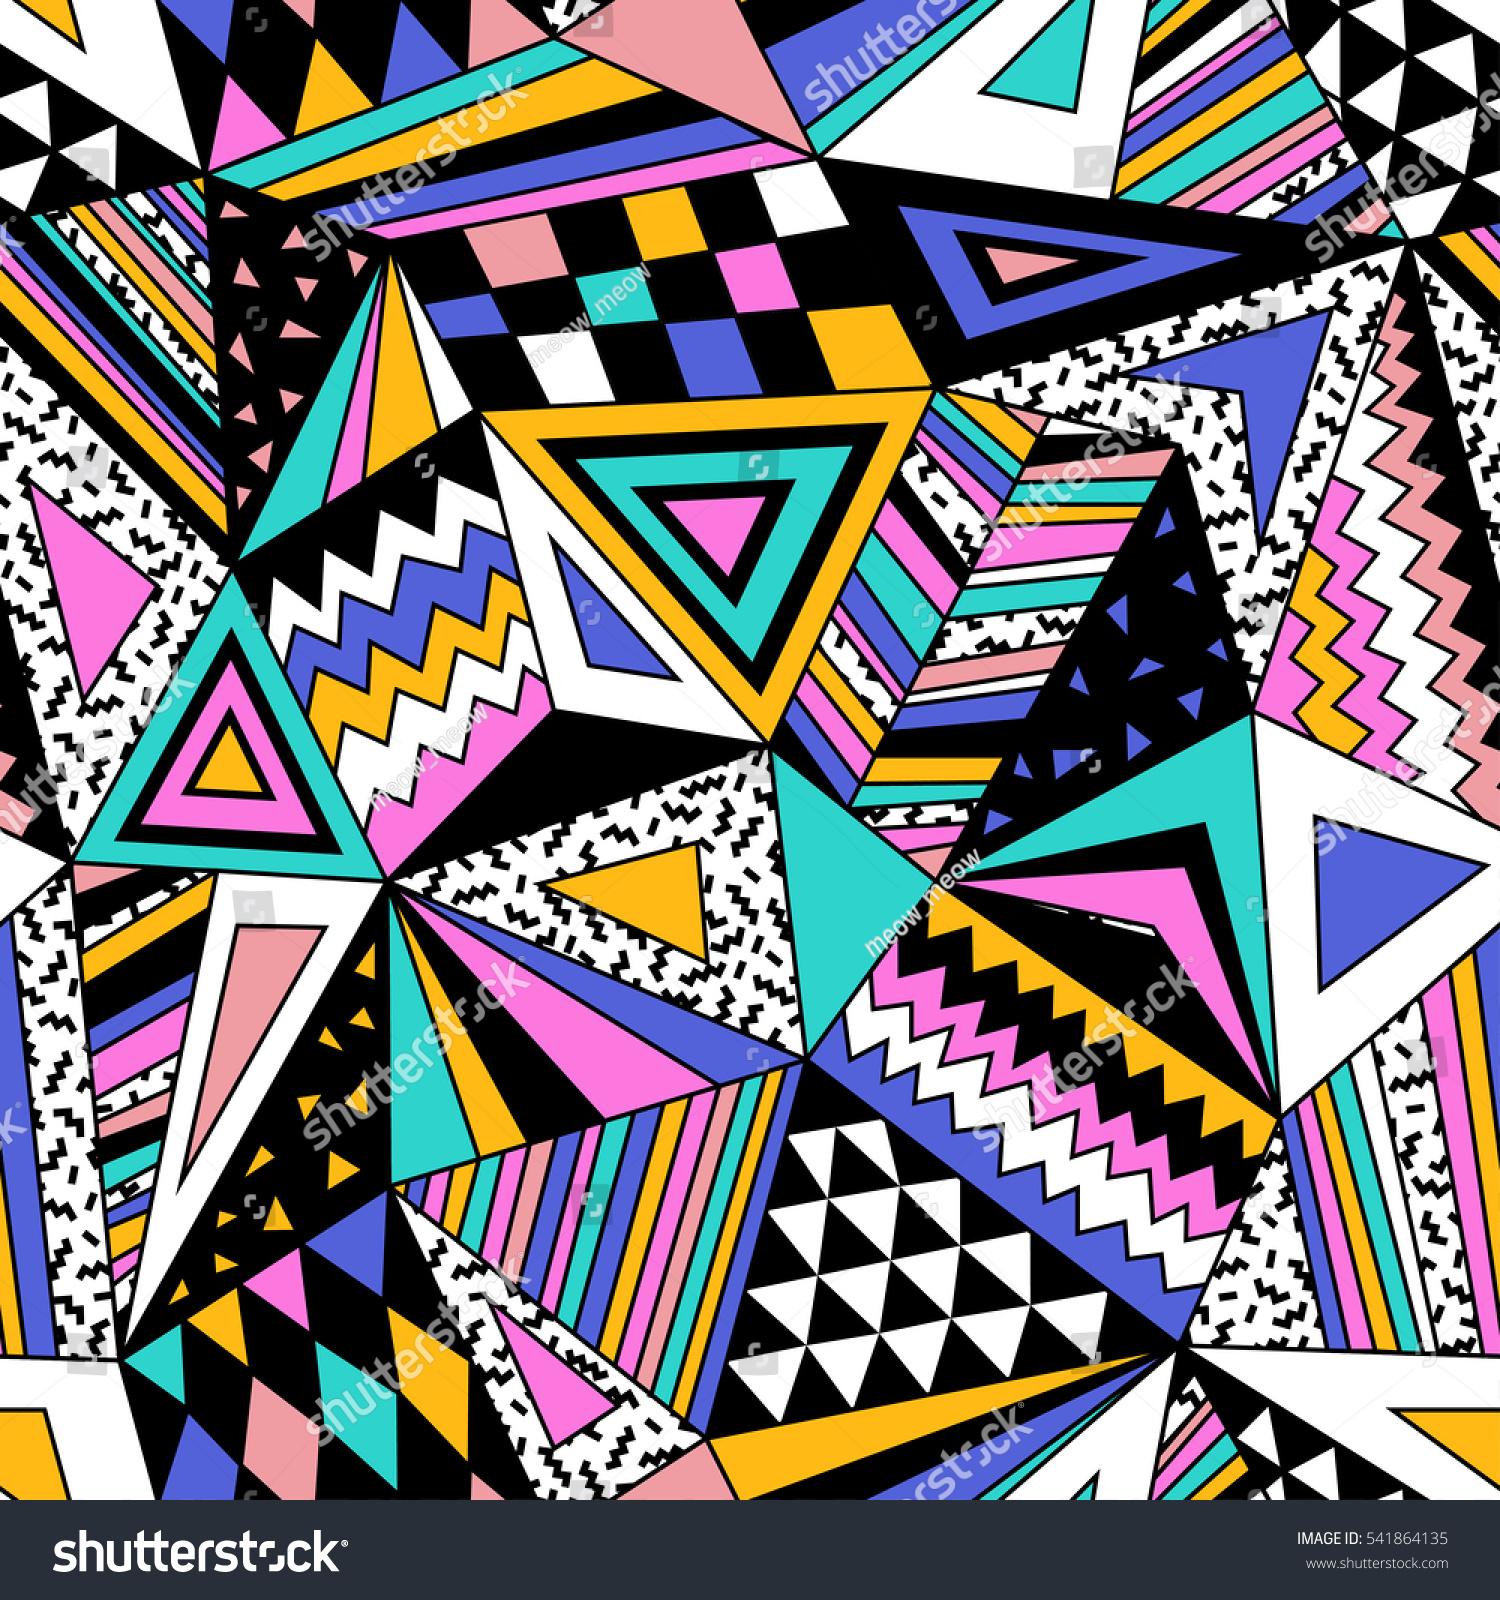 Designing Art Online